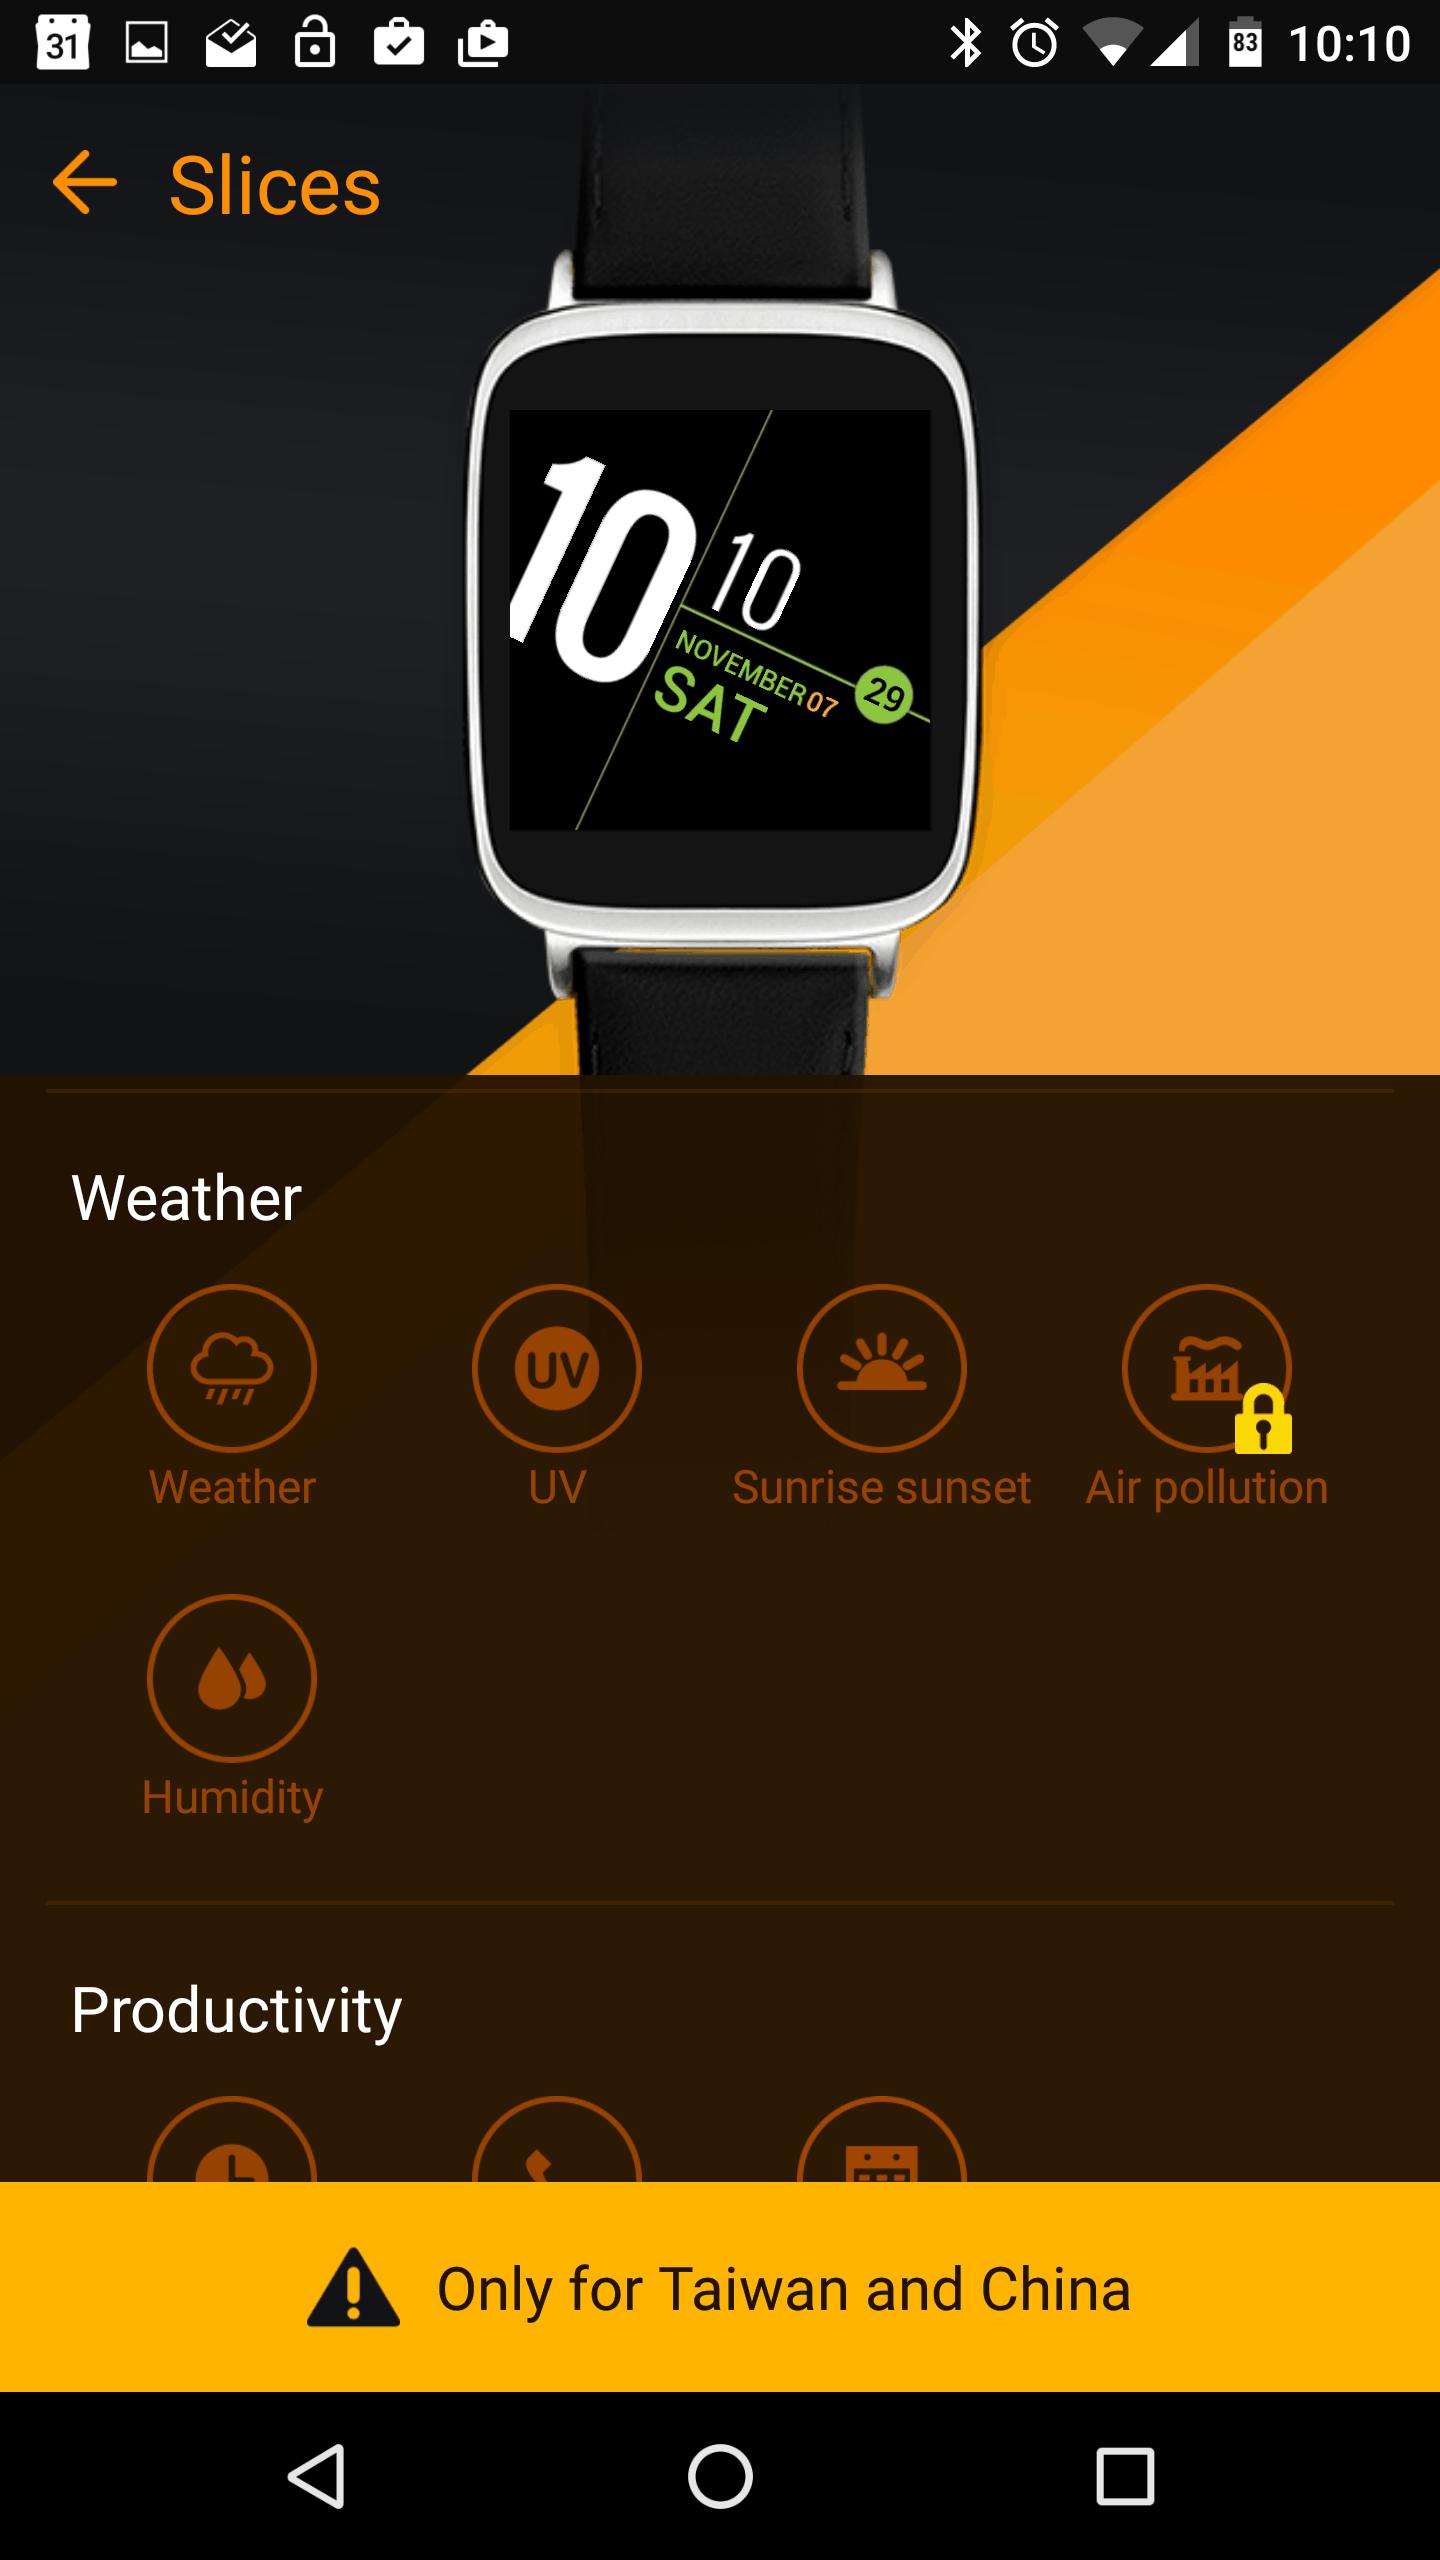 Asus ZenWatch 2 Manager App AH 14